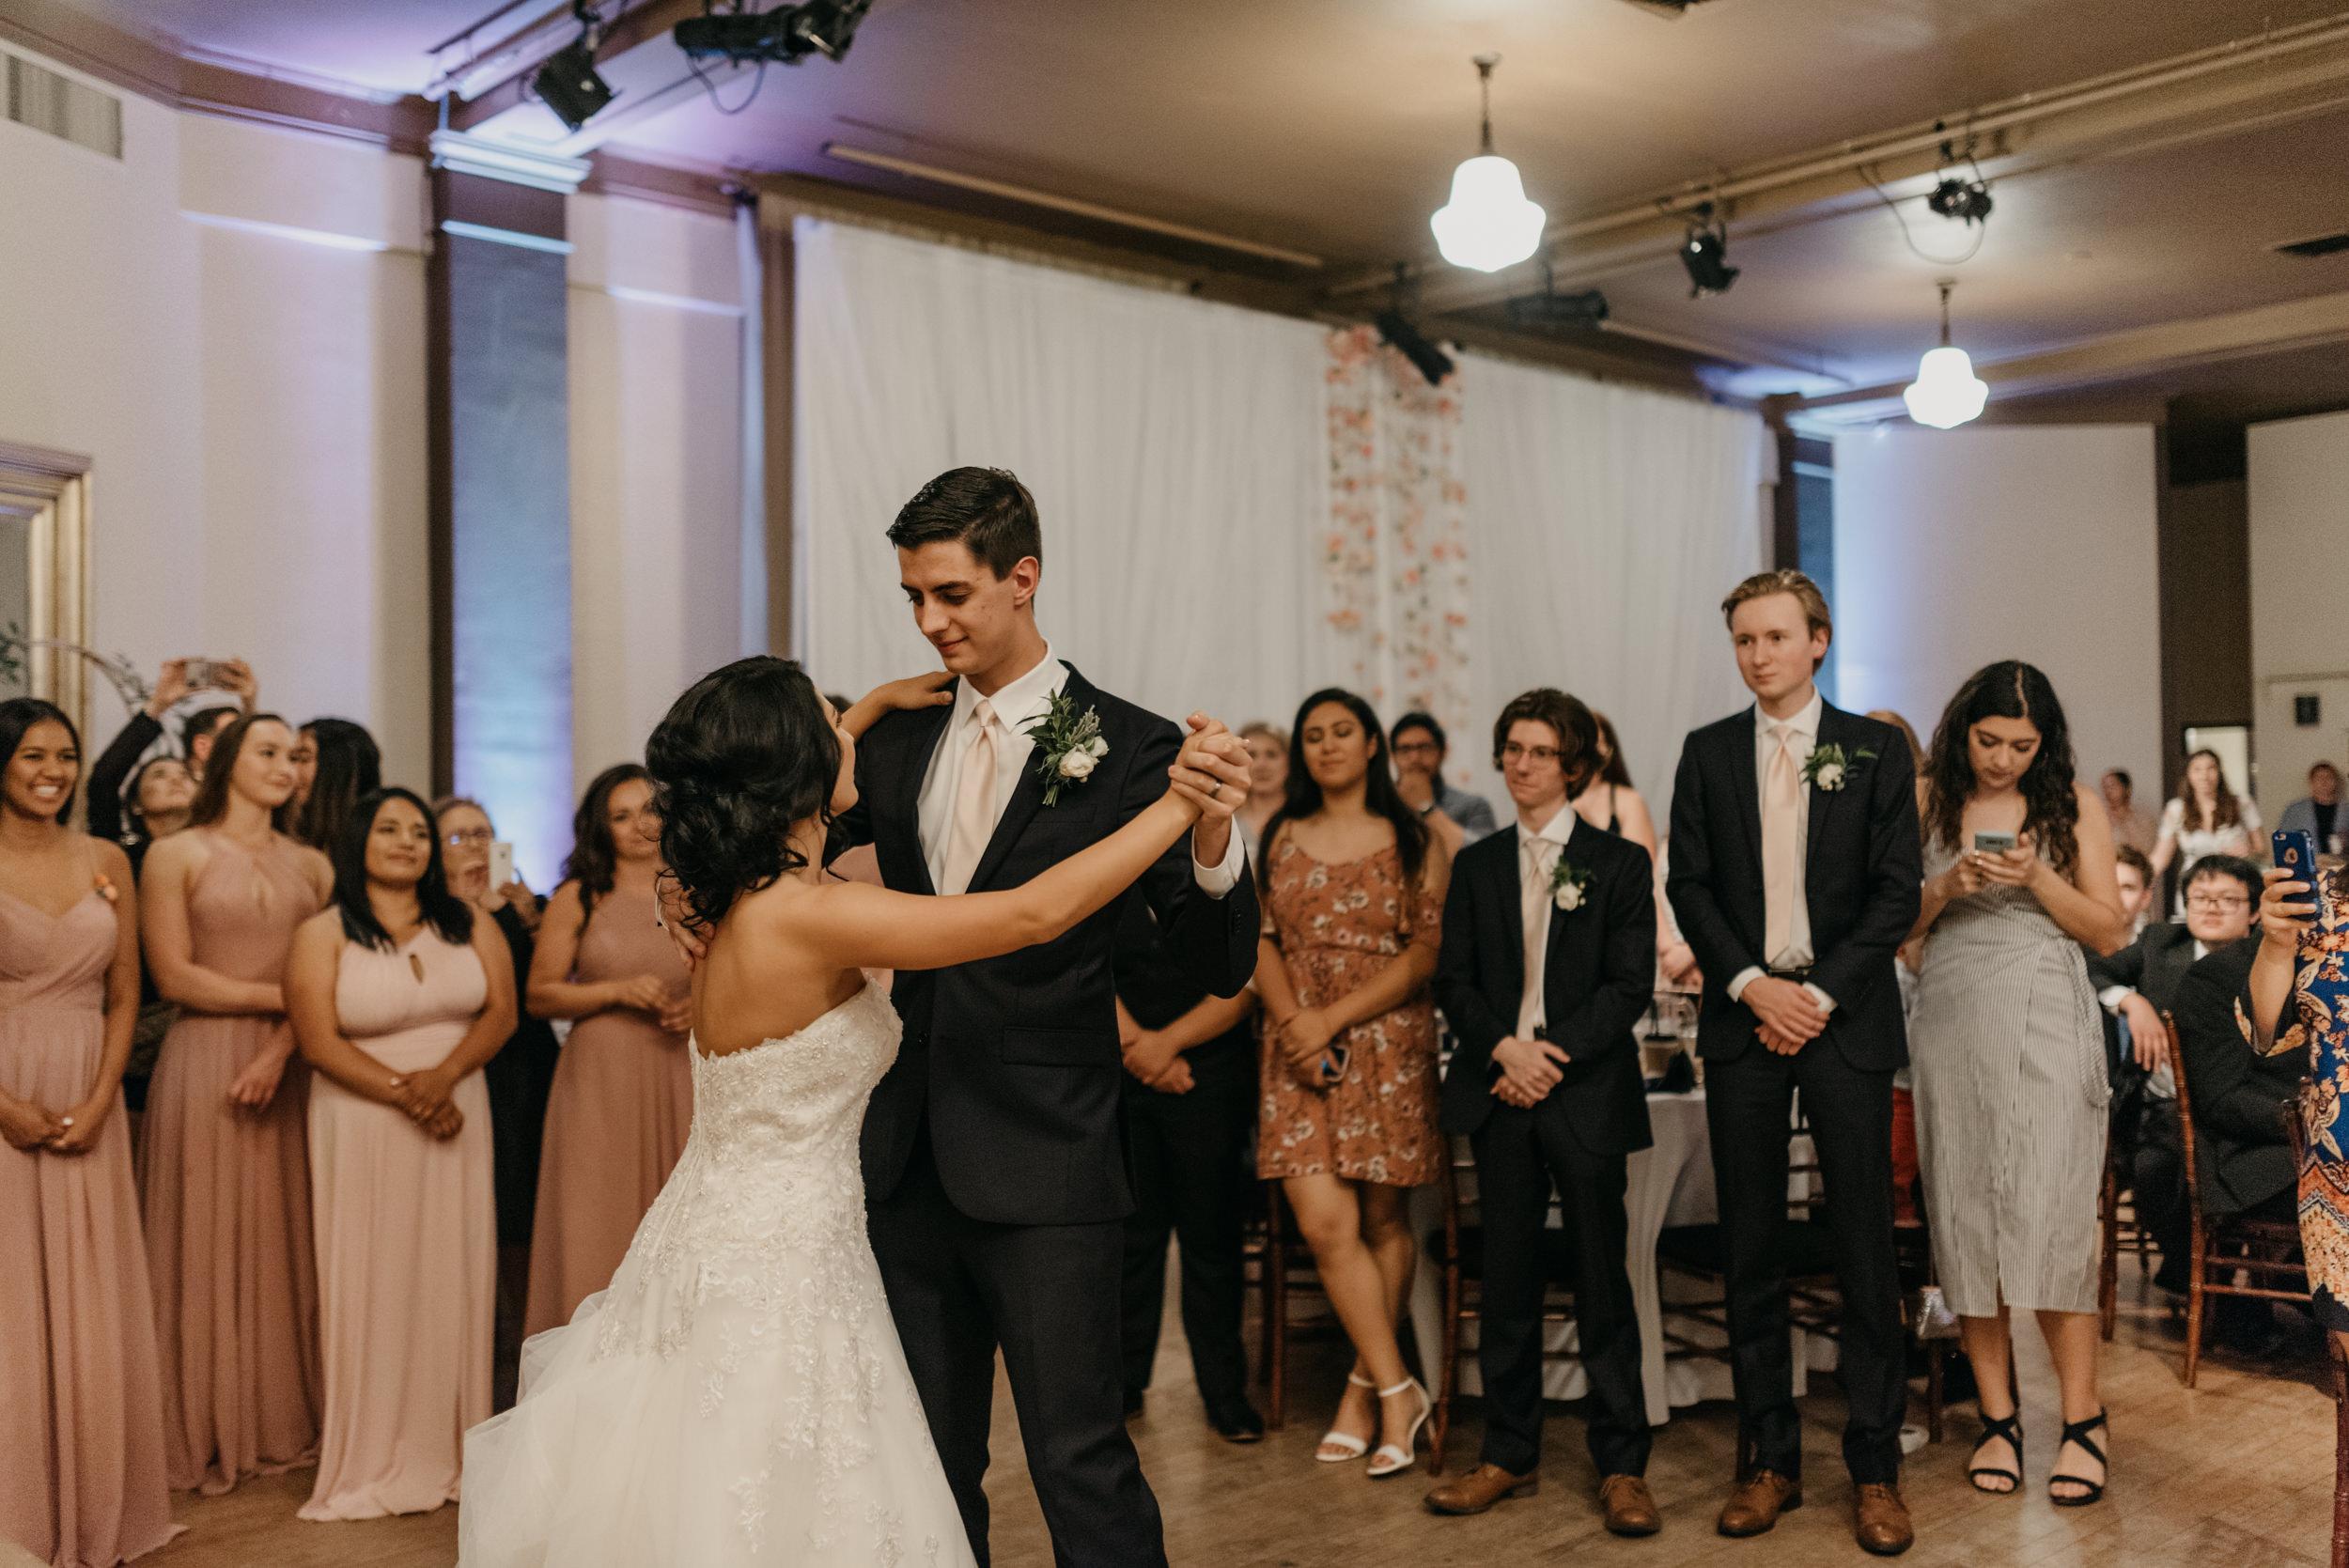 116-reception-west-end-ballroom-portland-wedding-photographer-8652.jpg